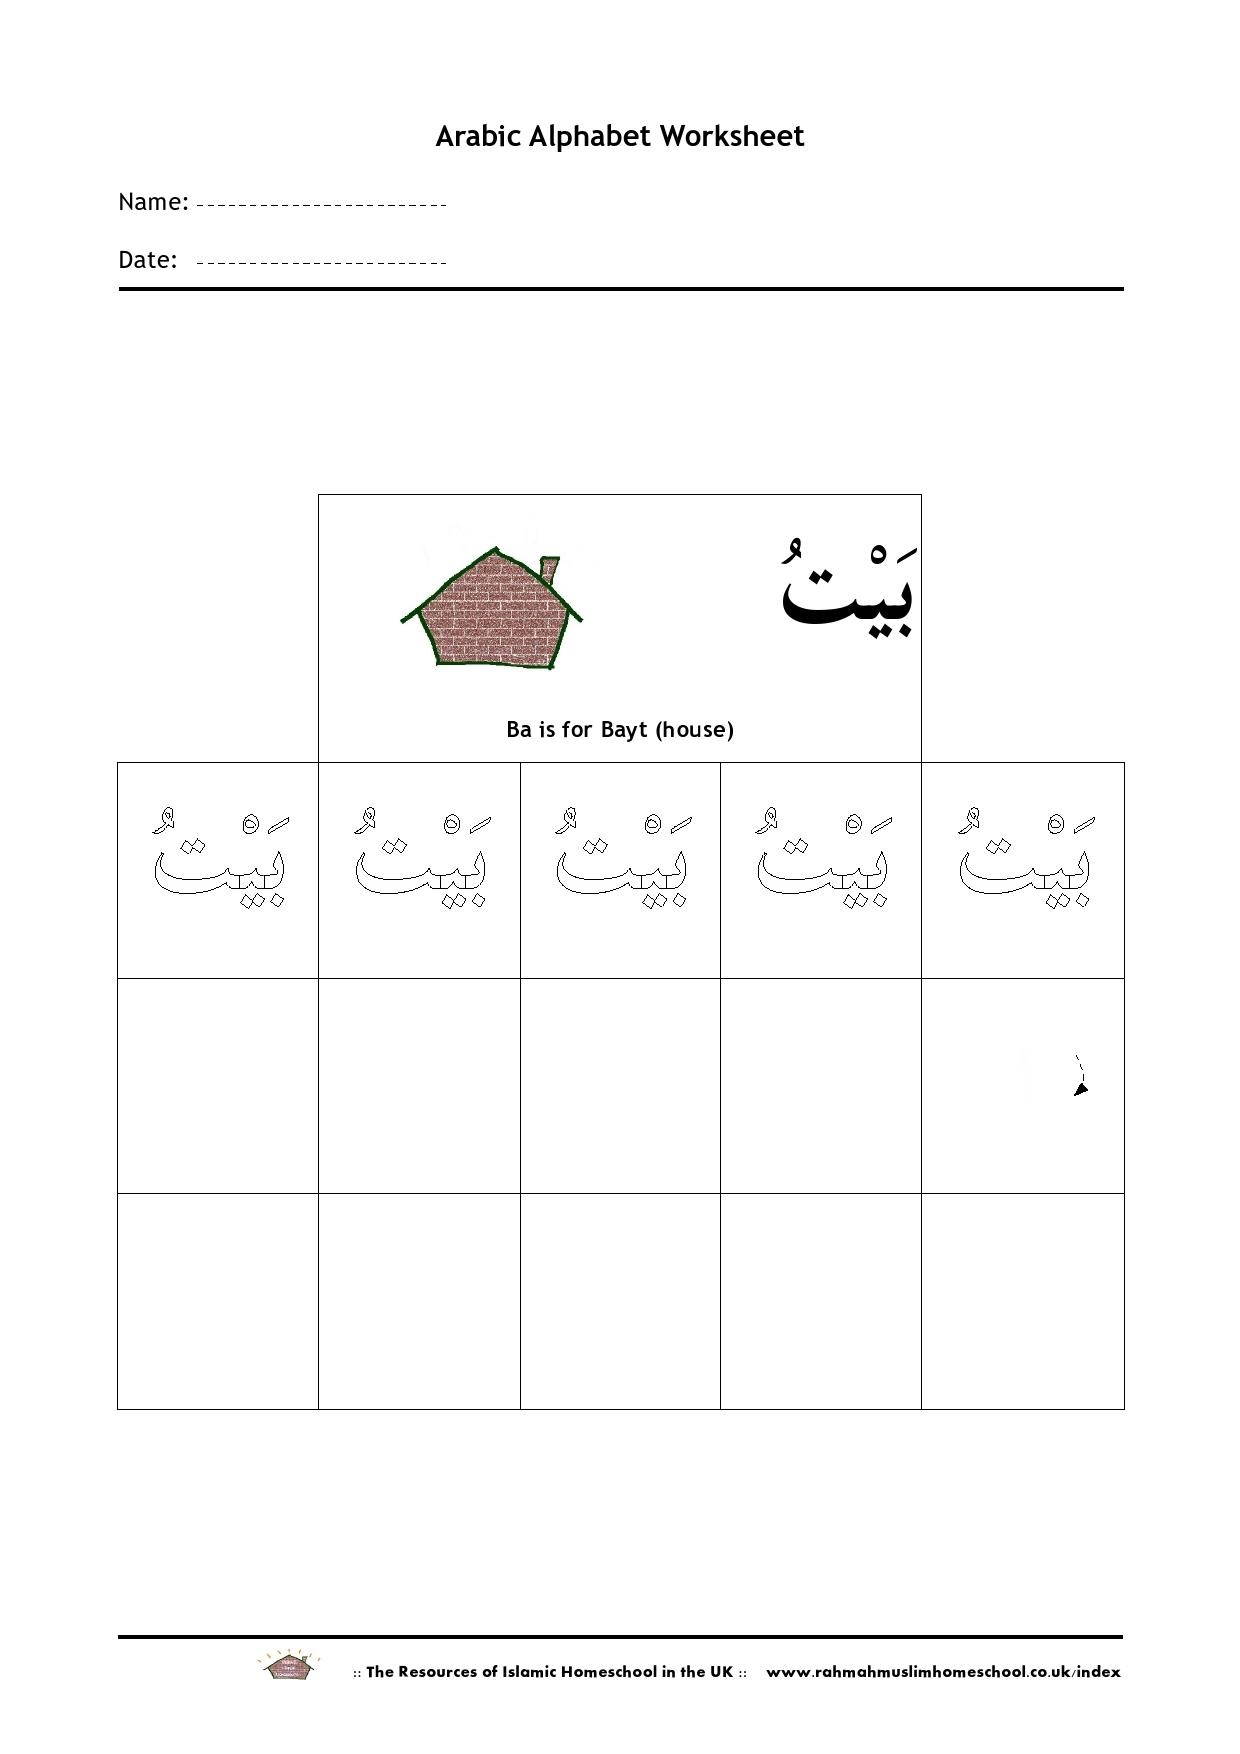 Free Arabic Alphabet Worksheet Ba Is For Bayt A House